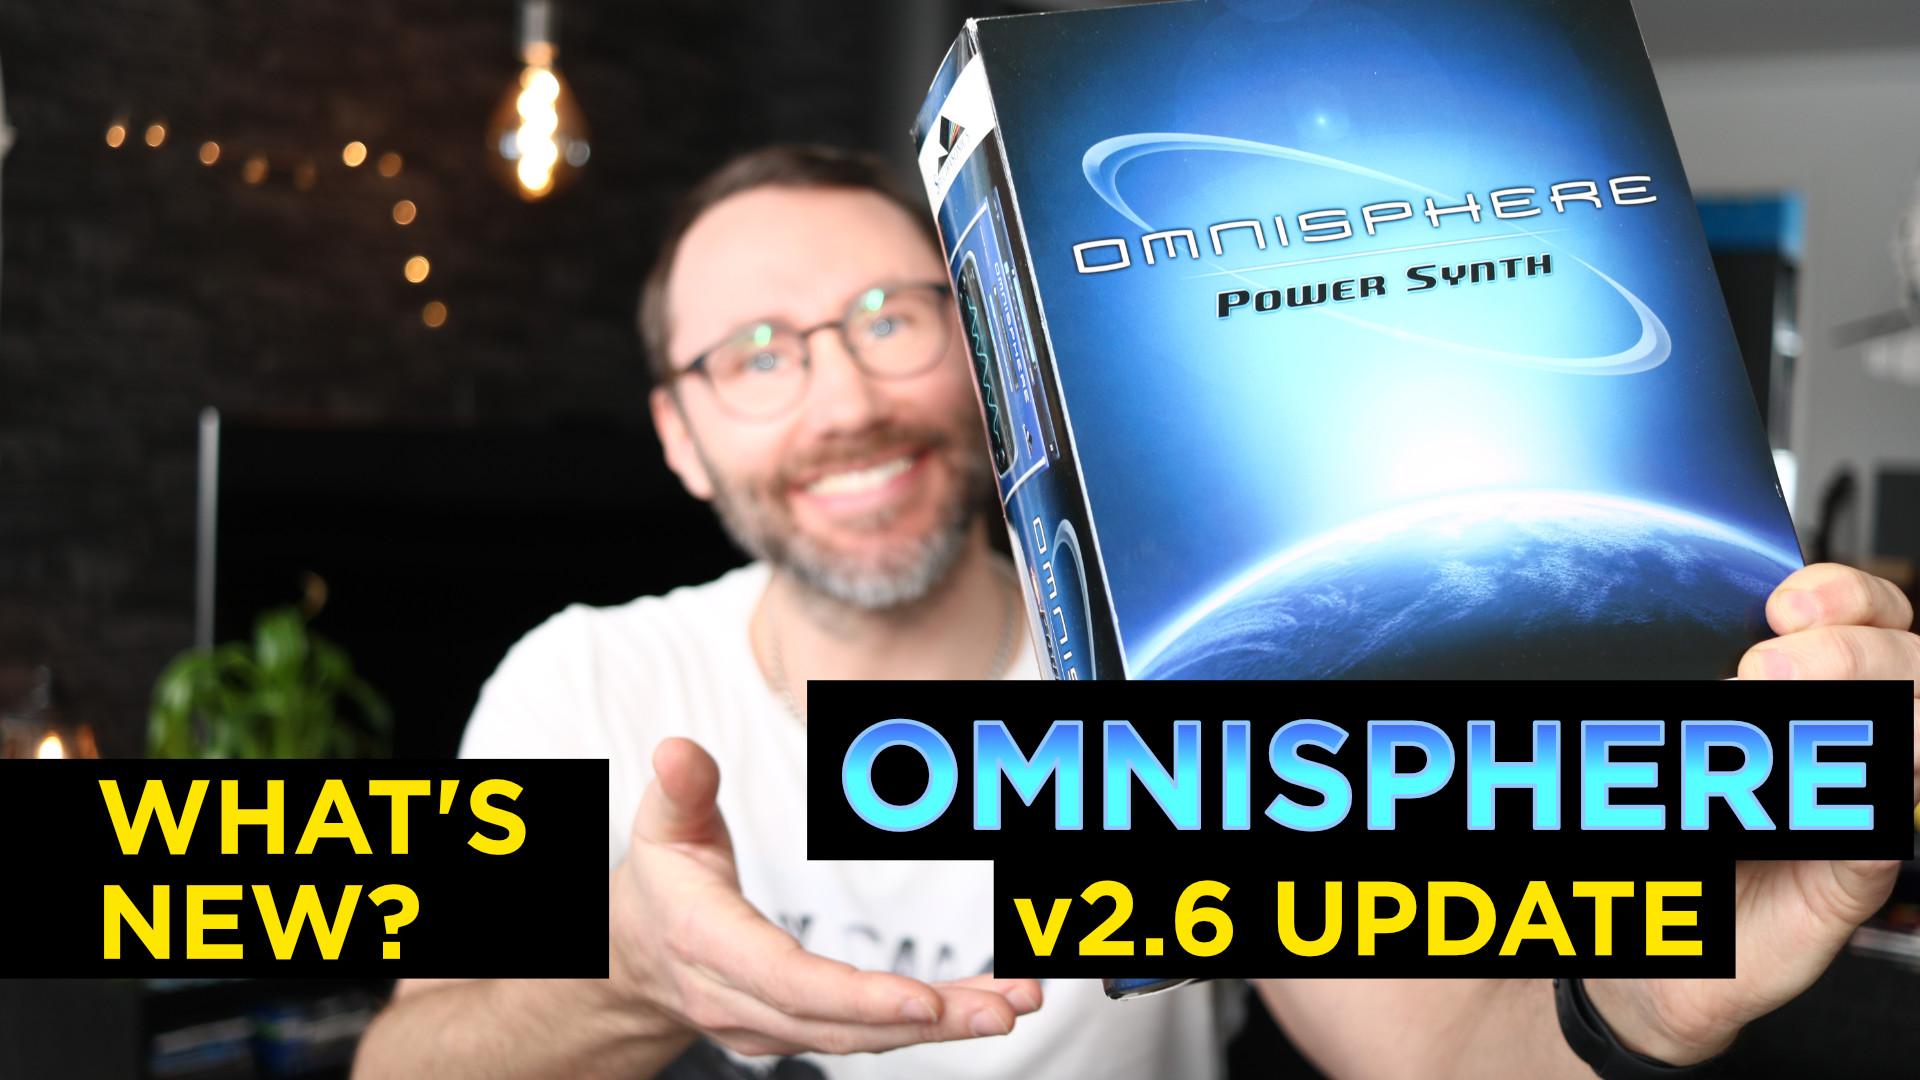 Omnisphere 2.6 First Look